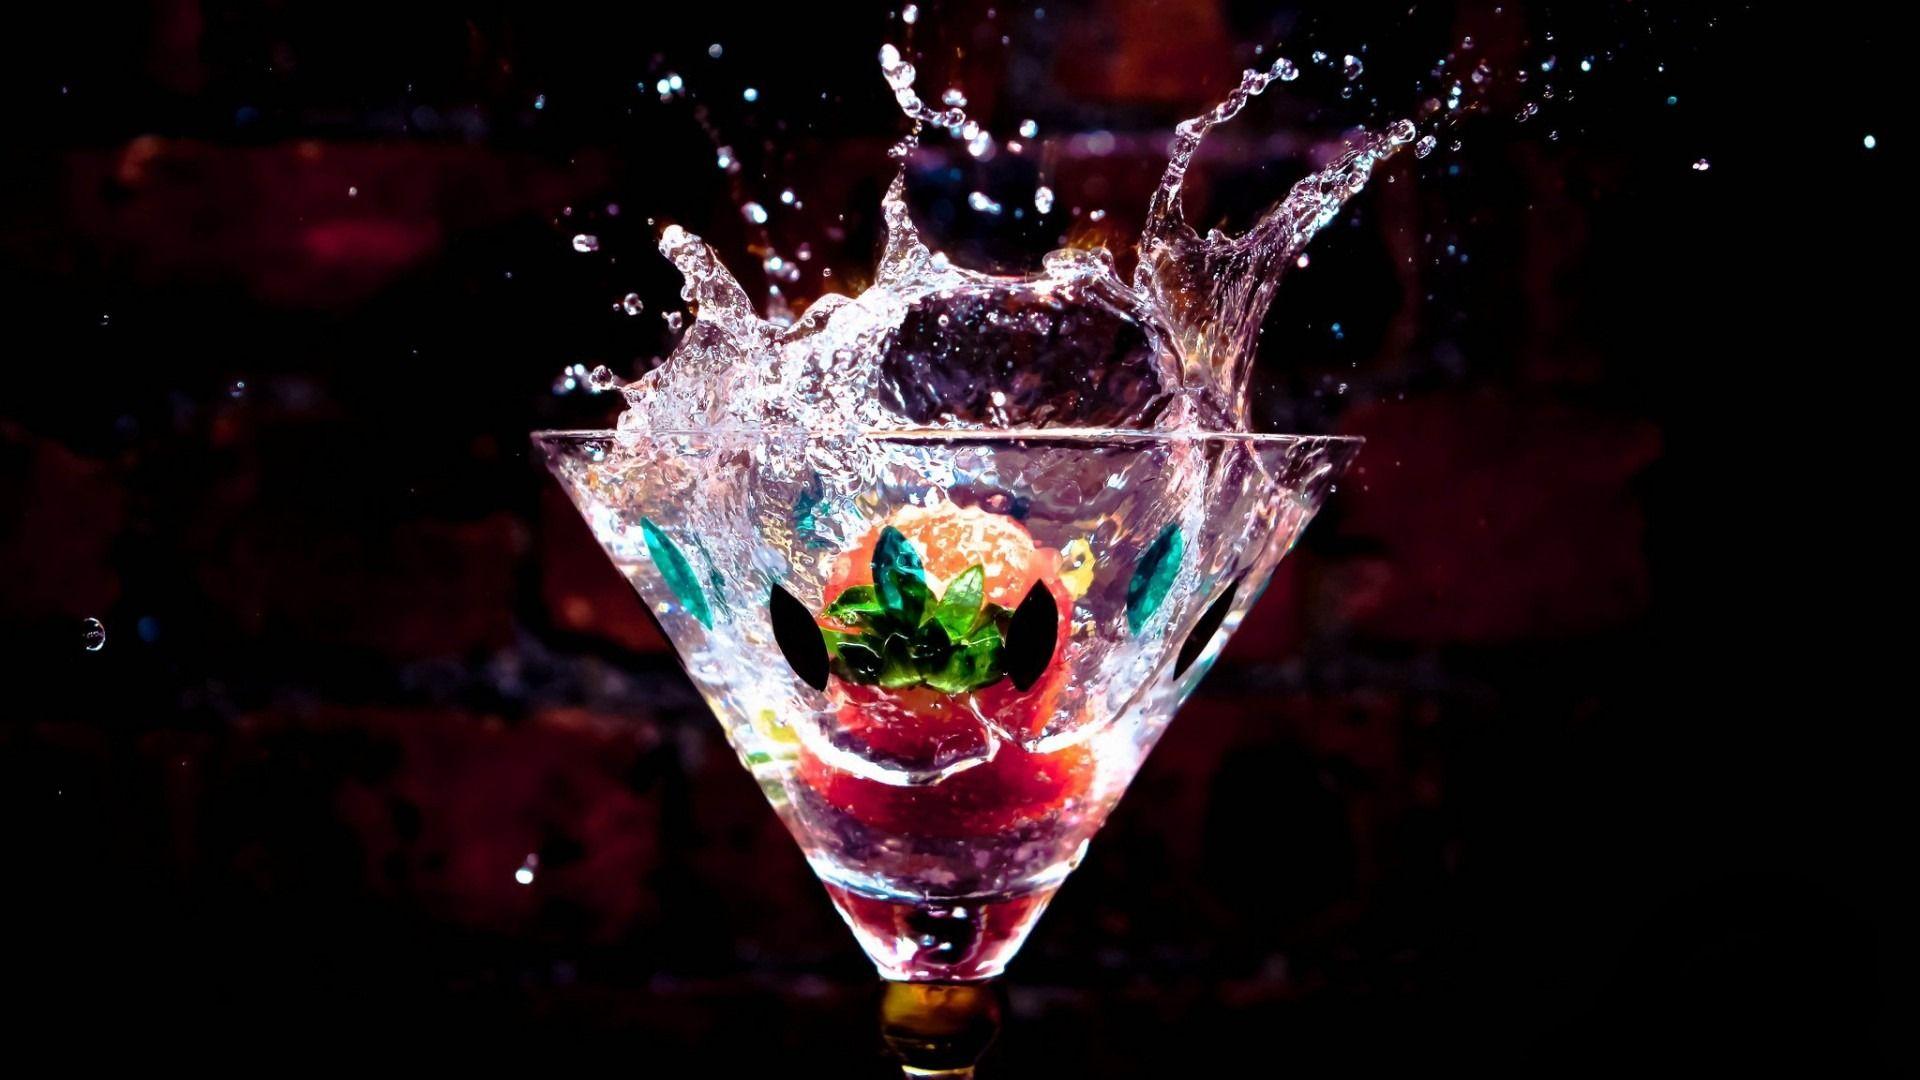 Cocktail Splash 1920×1080 Wallpaper HD Desktop Widescreen